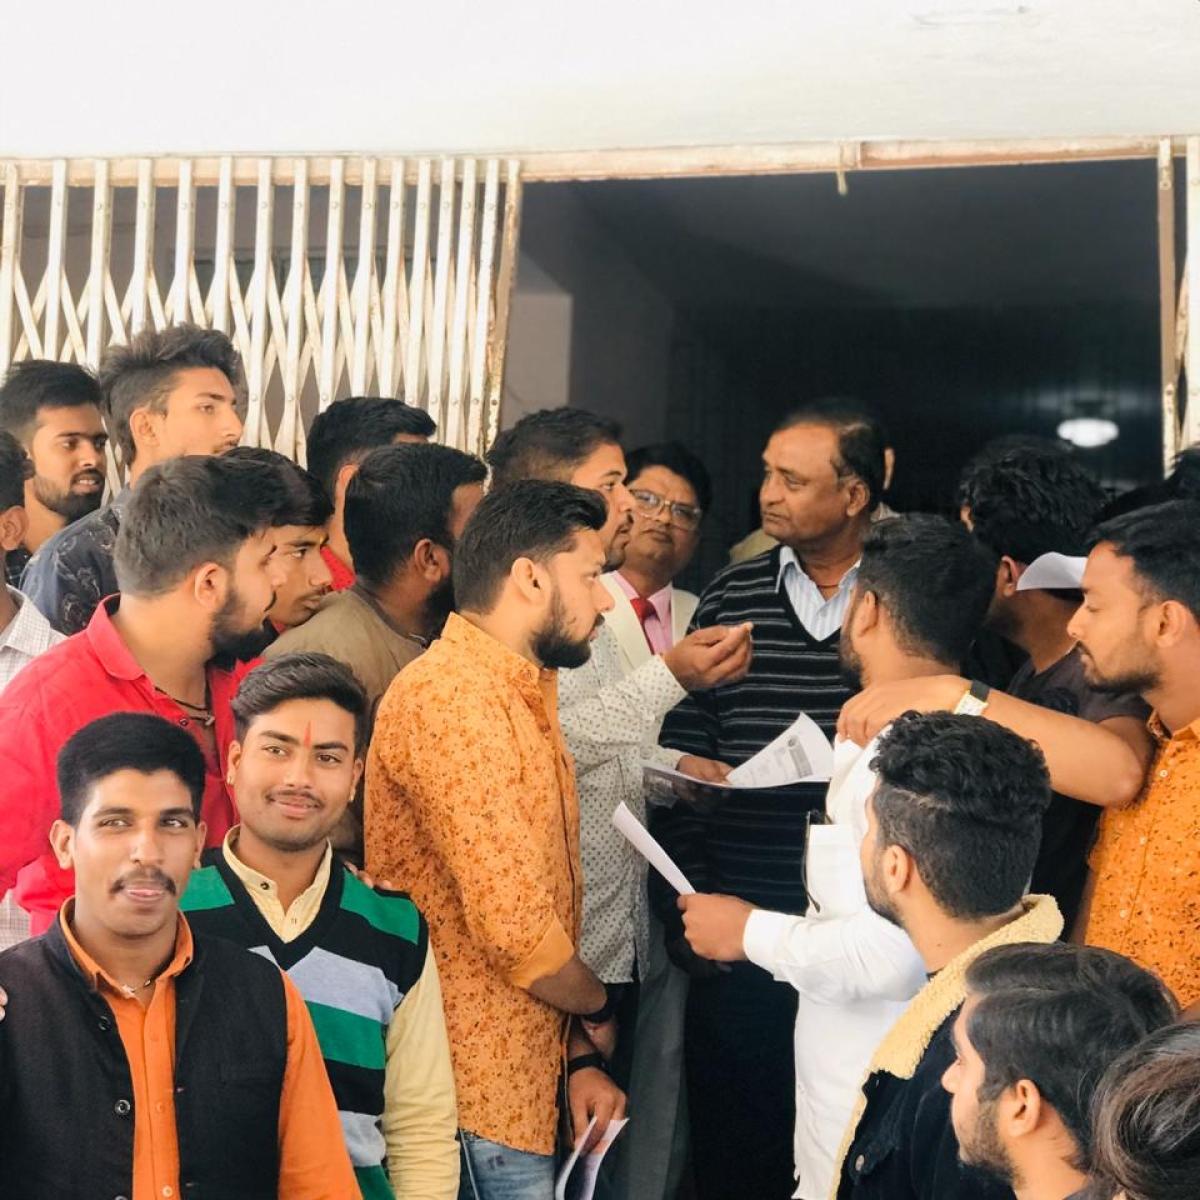 Ujjain: ABVP submits memo regarding water wastage in VU campus